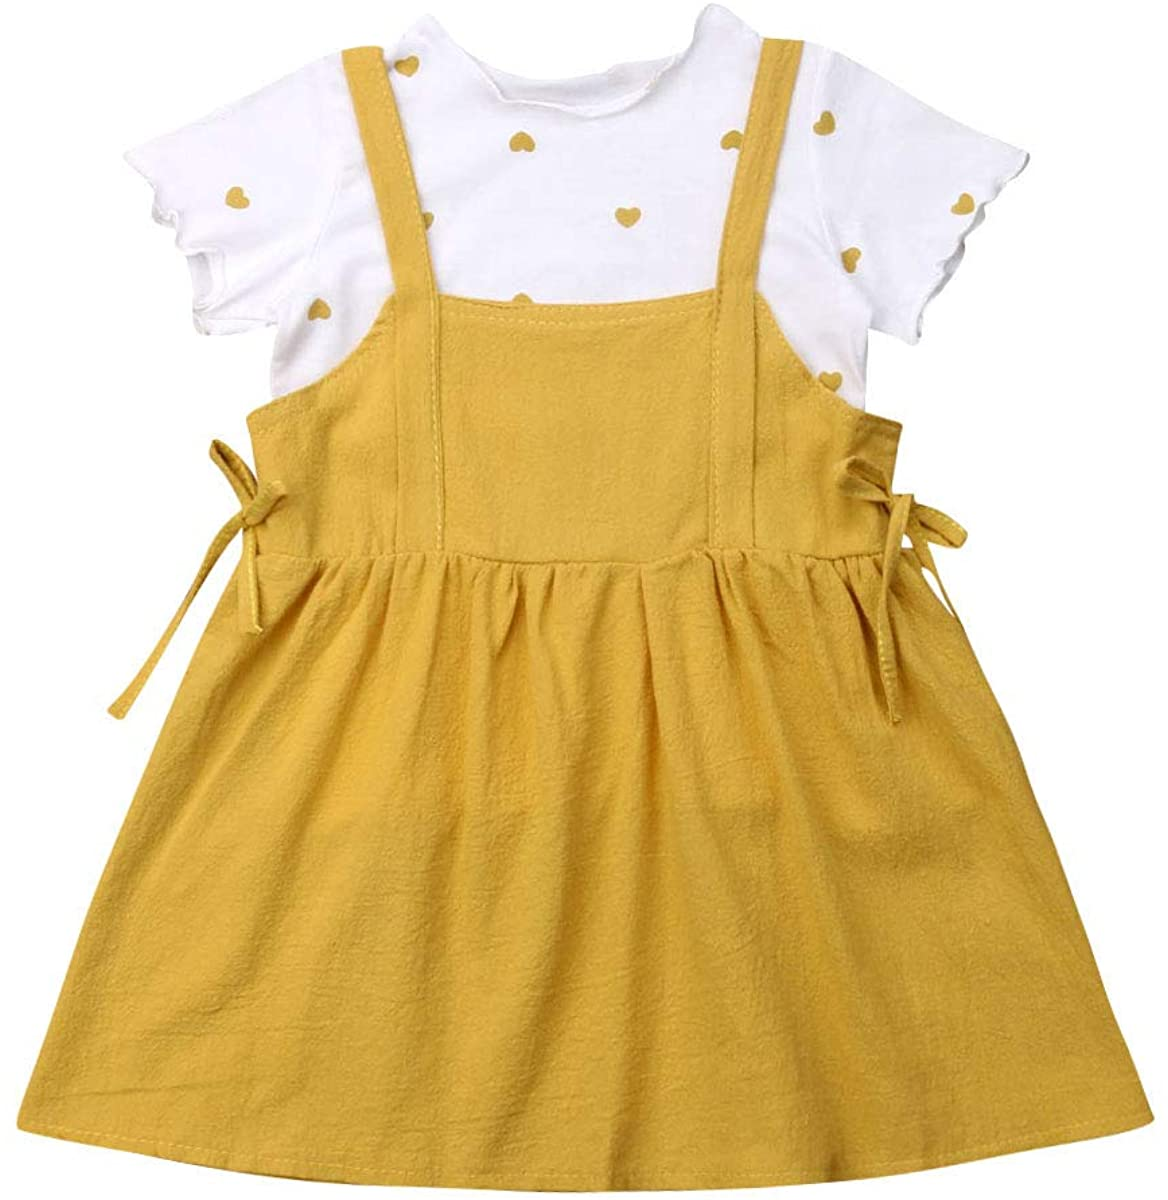 Toddler Kid Baby Girl 2PCS Playwear Skirt Set Print Heart T-Shirt with Suspender Dress Outfit